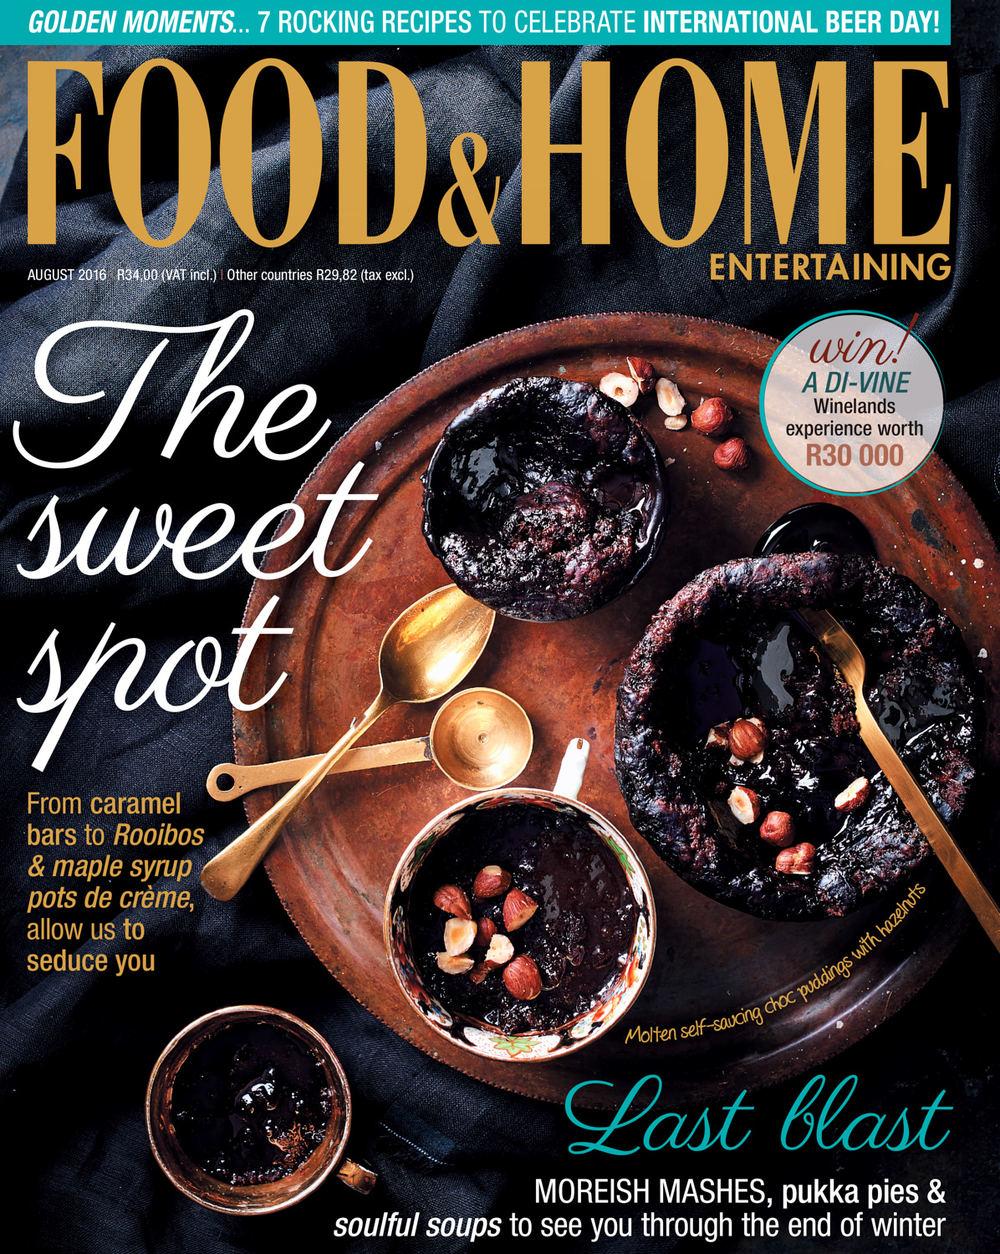 Molten Self-Saucing Choc Puddings With Hazelnuts